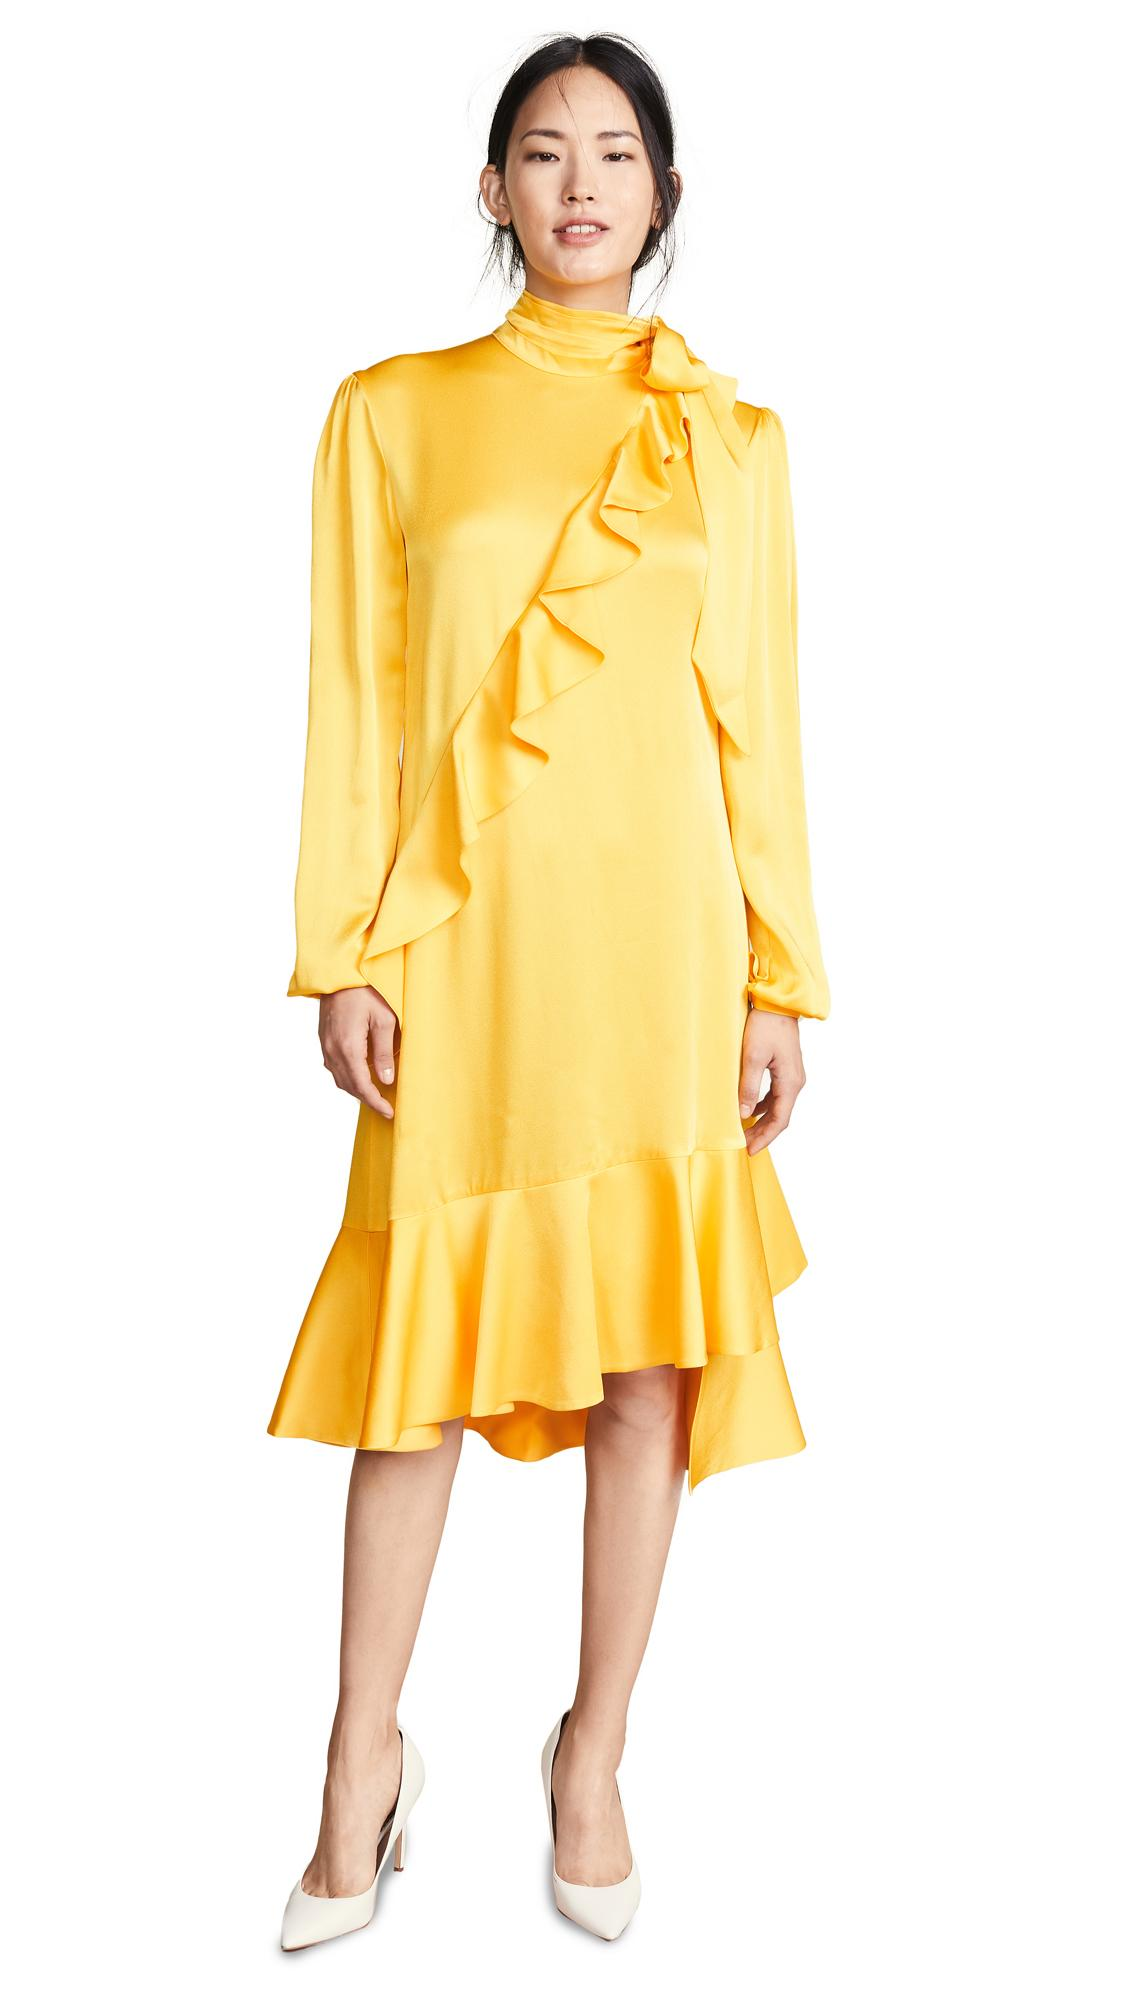 bf00f48dfc15 Marianna Senchina Midi Turtleneck Dress In Yellow